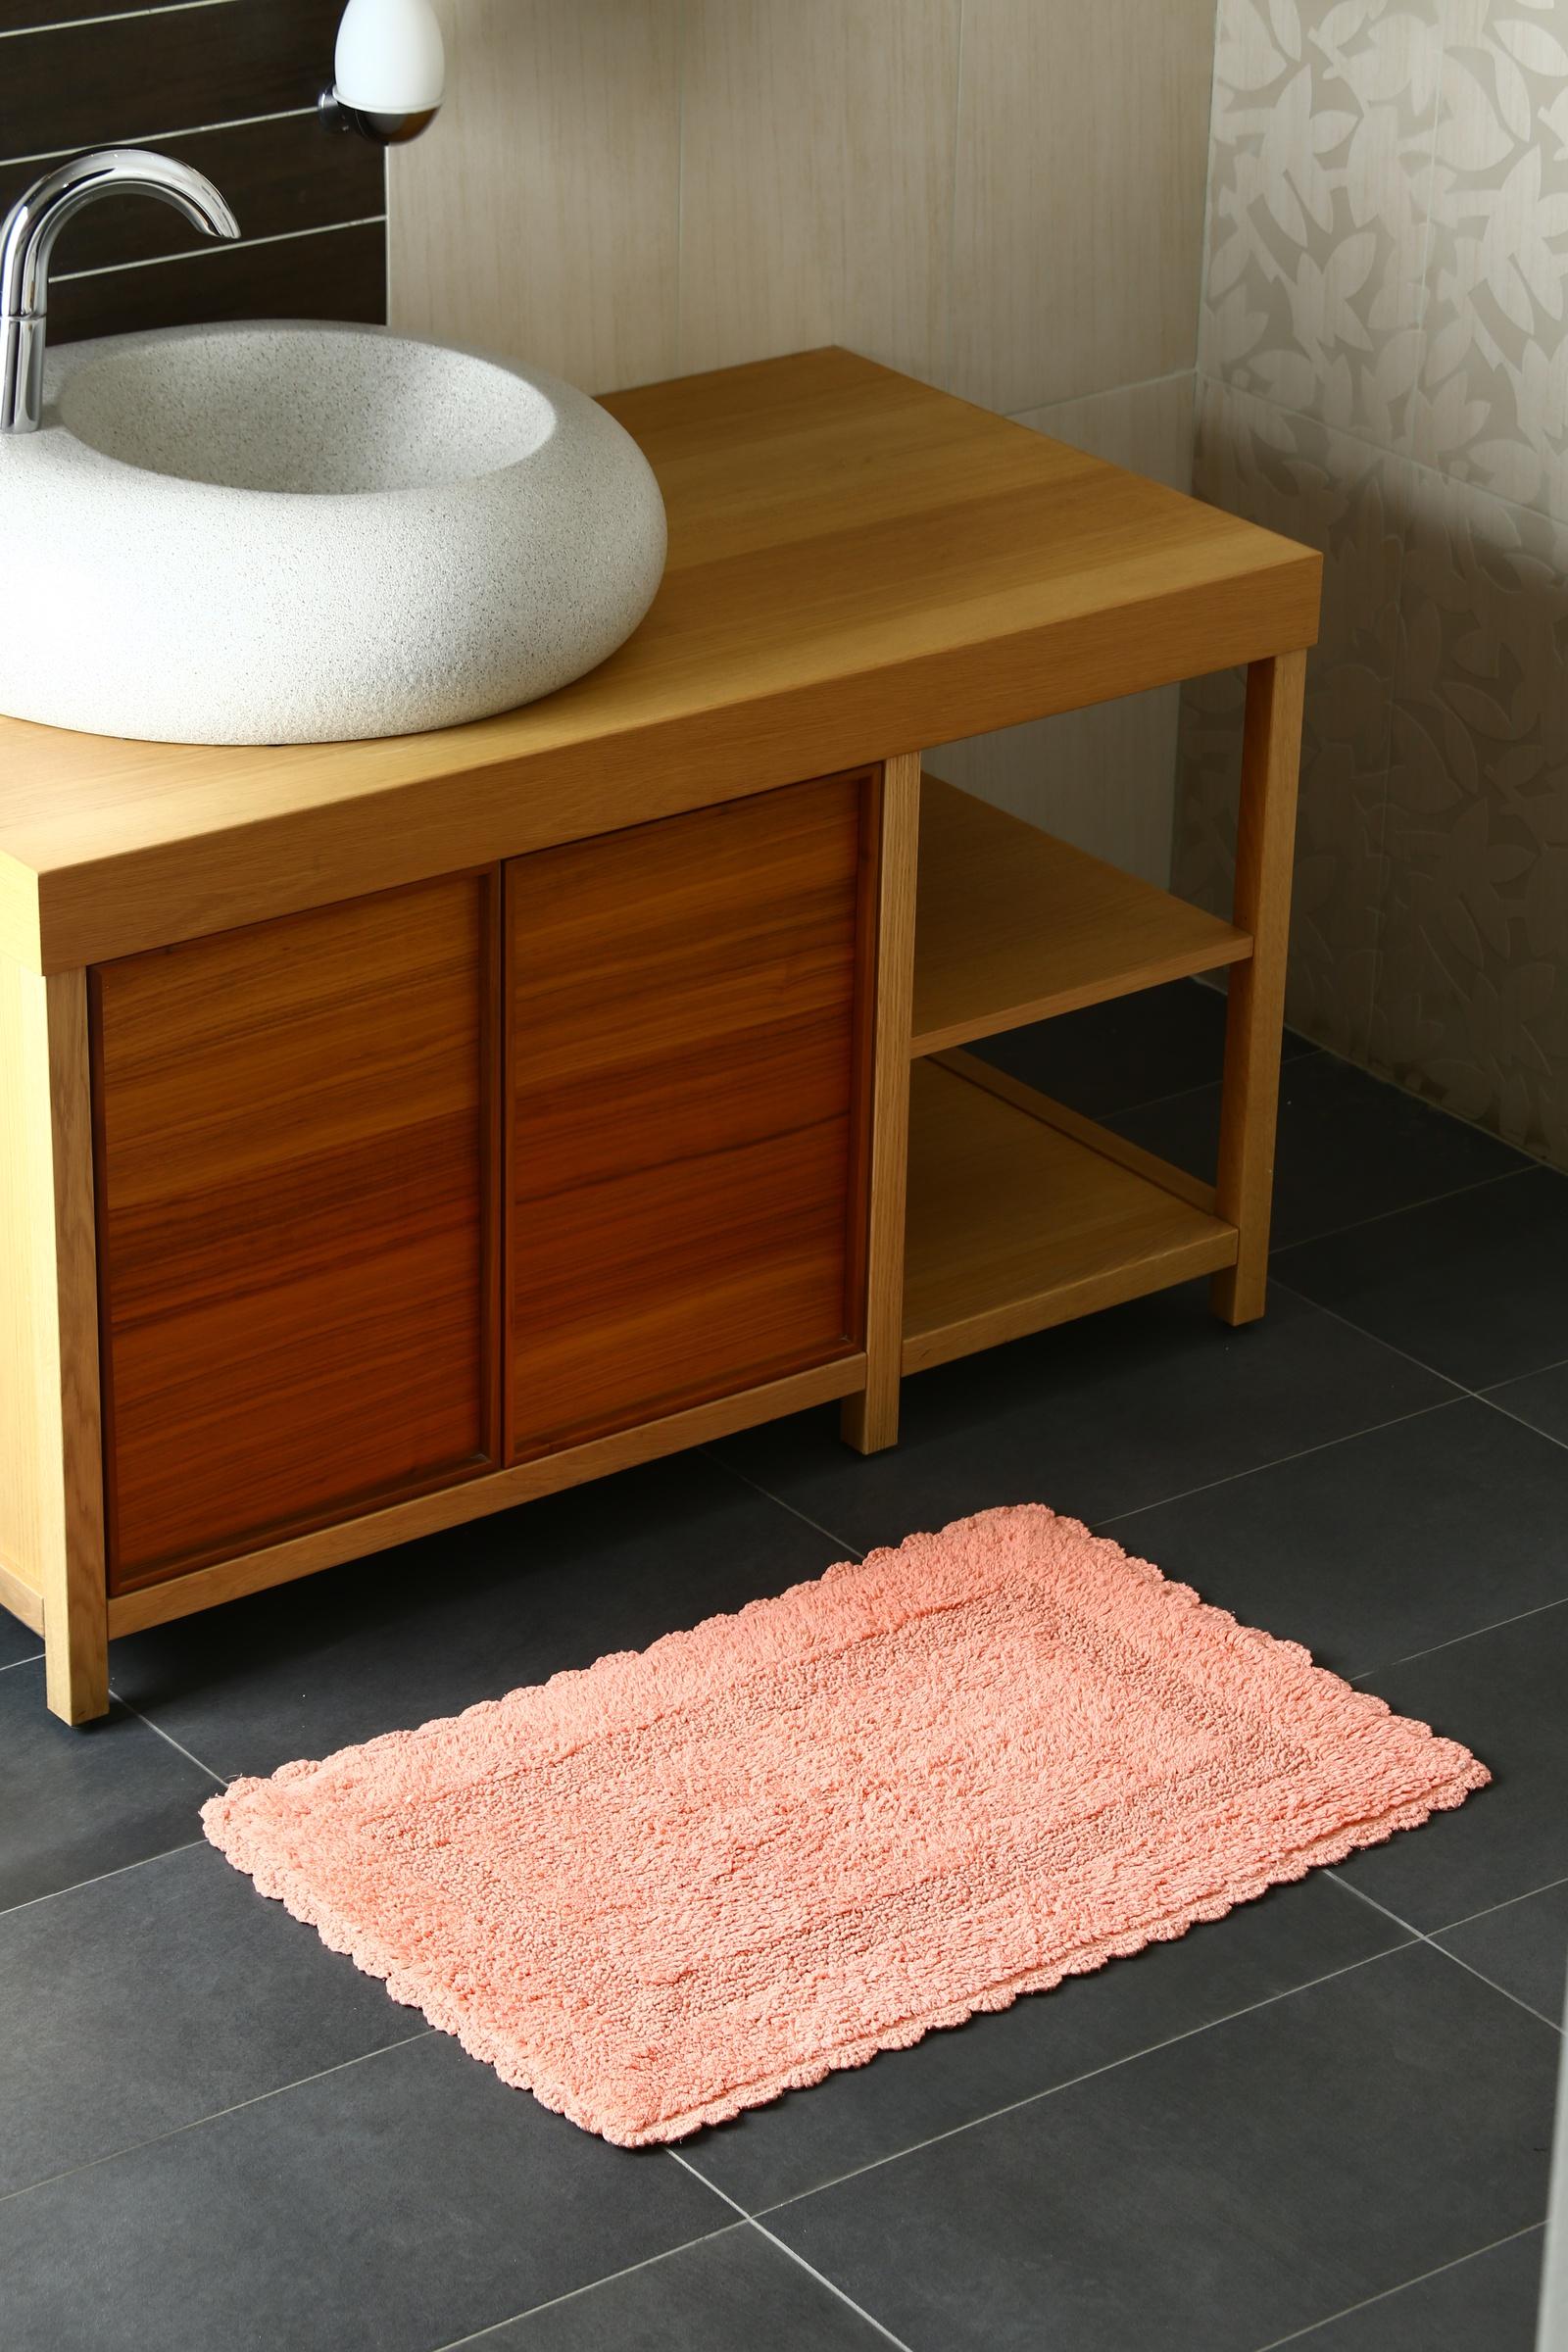 Фото - Коврик для ванной Arloni Коврик Лейс (коралл) с кружевом 50х80 arloni коврик самотканный для ванной